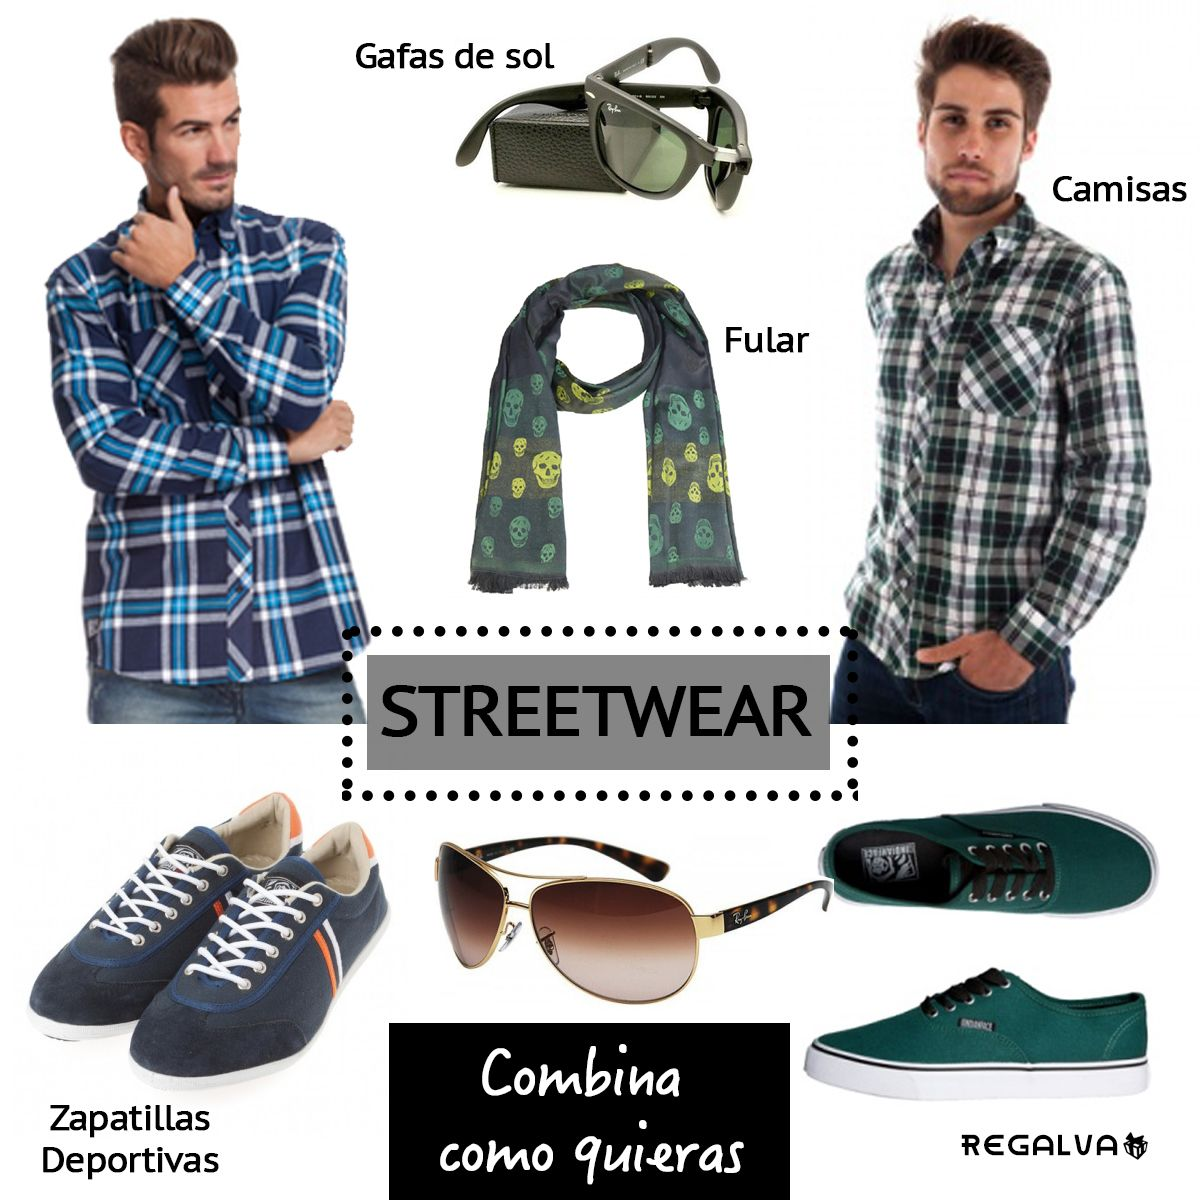 ropadehombre  camisas  gafasdesol  azul  verde  moda  ropa  tendencias   ropaurbana cab2748077c